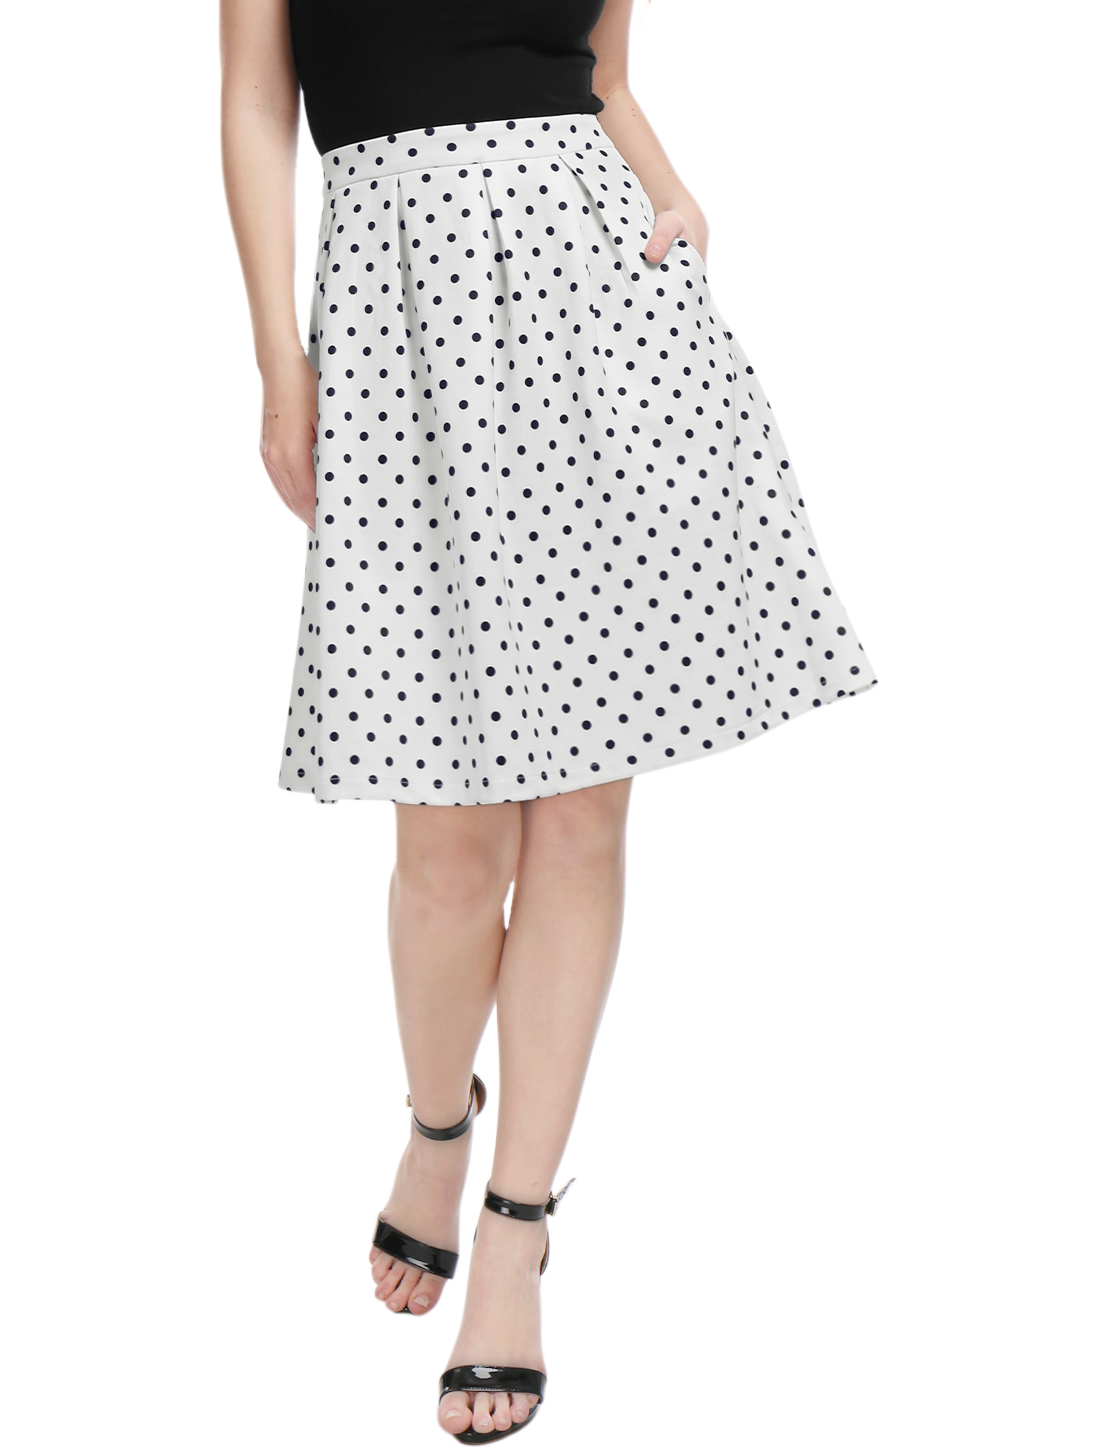 Women-Side-Pockets-Box-Pleated-Polka-Dots-Prints-Full-Skirt